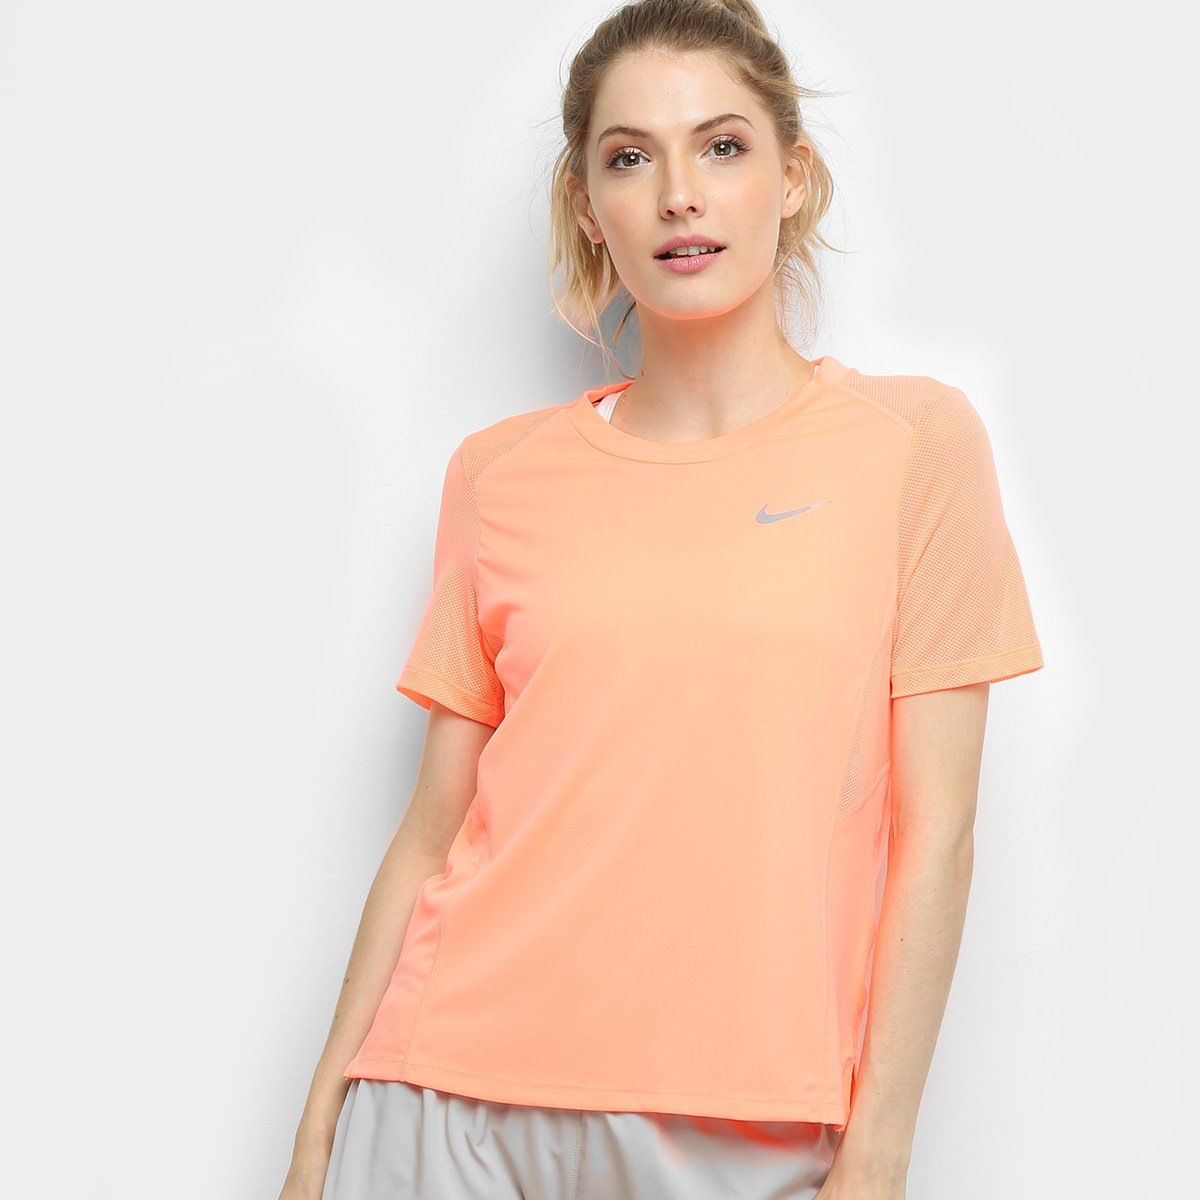 Ss Netshoes Agora Camiseta Miler Compre Coral Feminina E Azul Nike ww8SEz